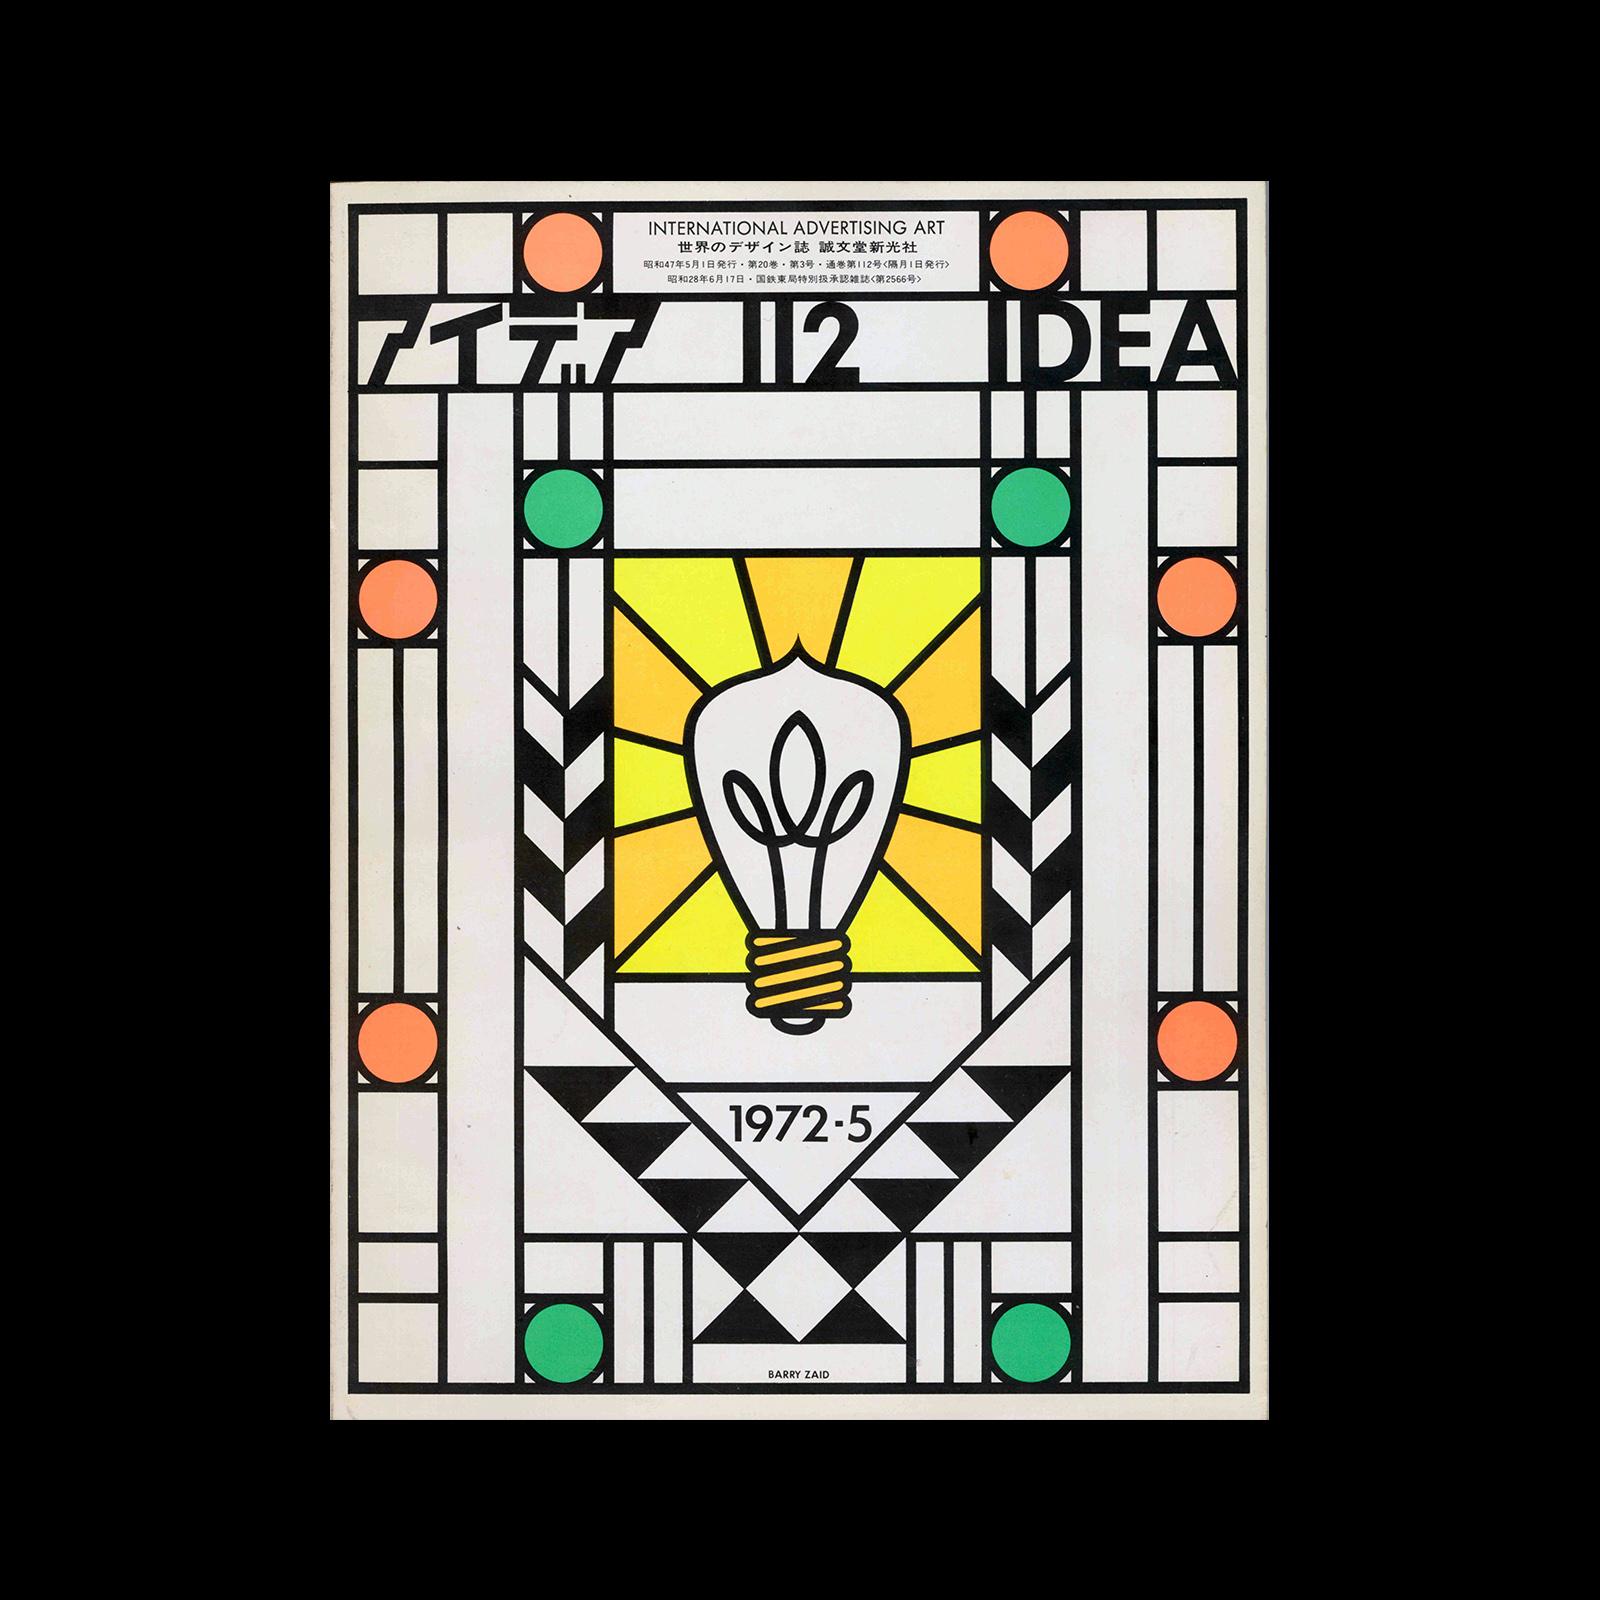 Idea 112, 1972-7.  Cover design by Barry Zaid